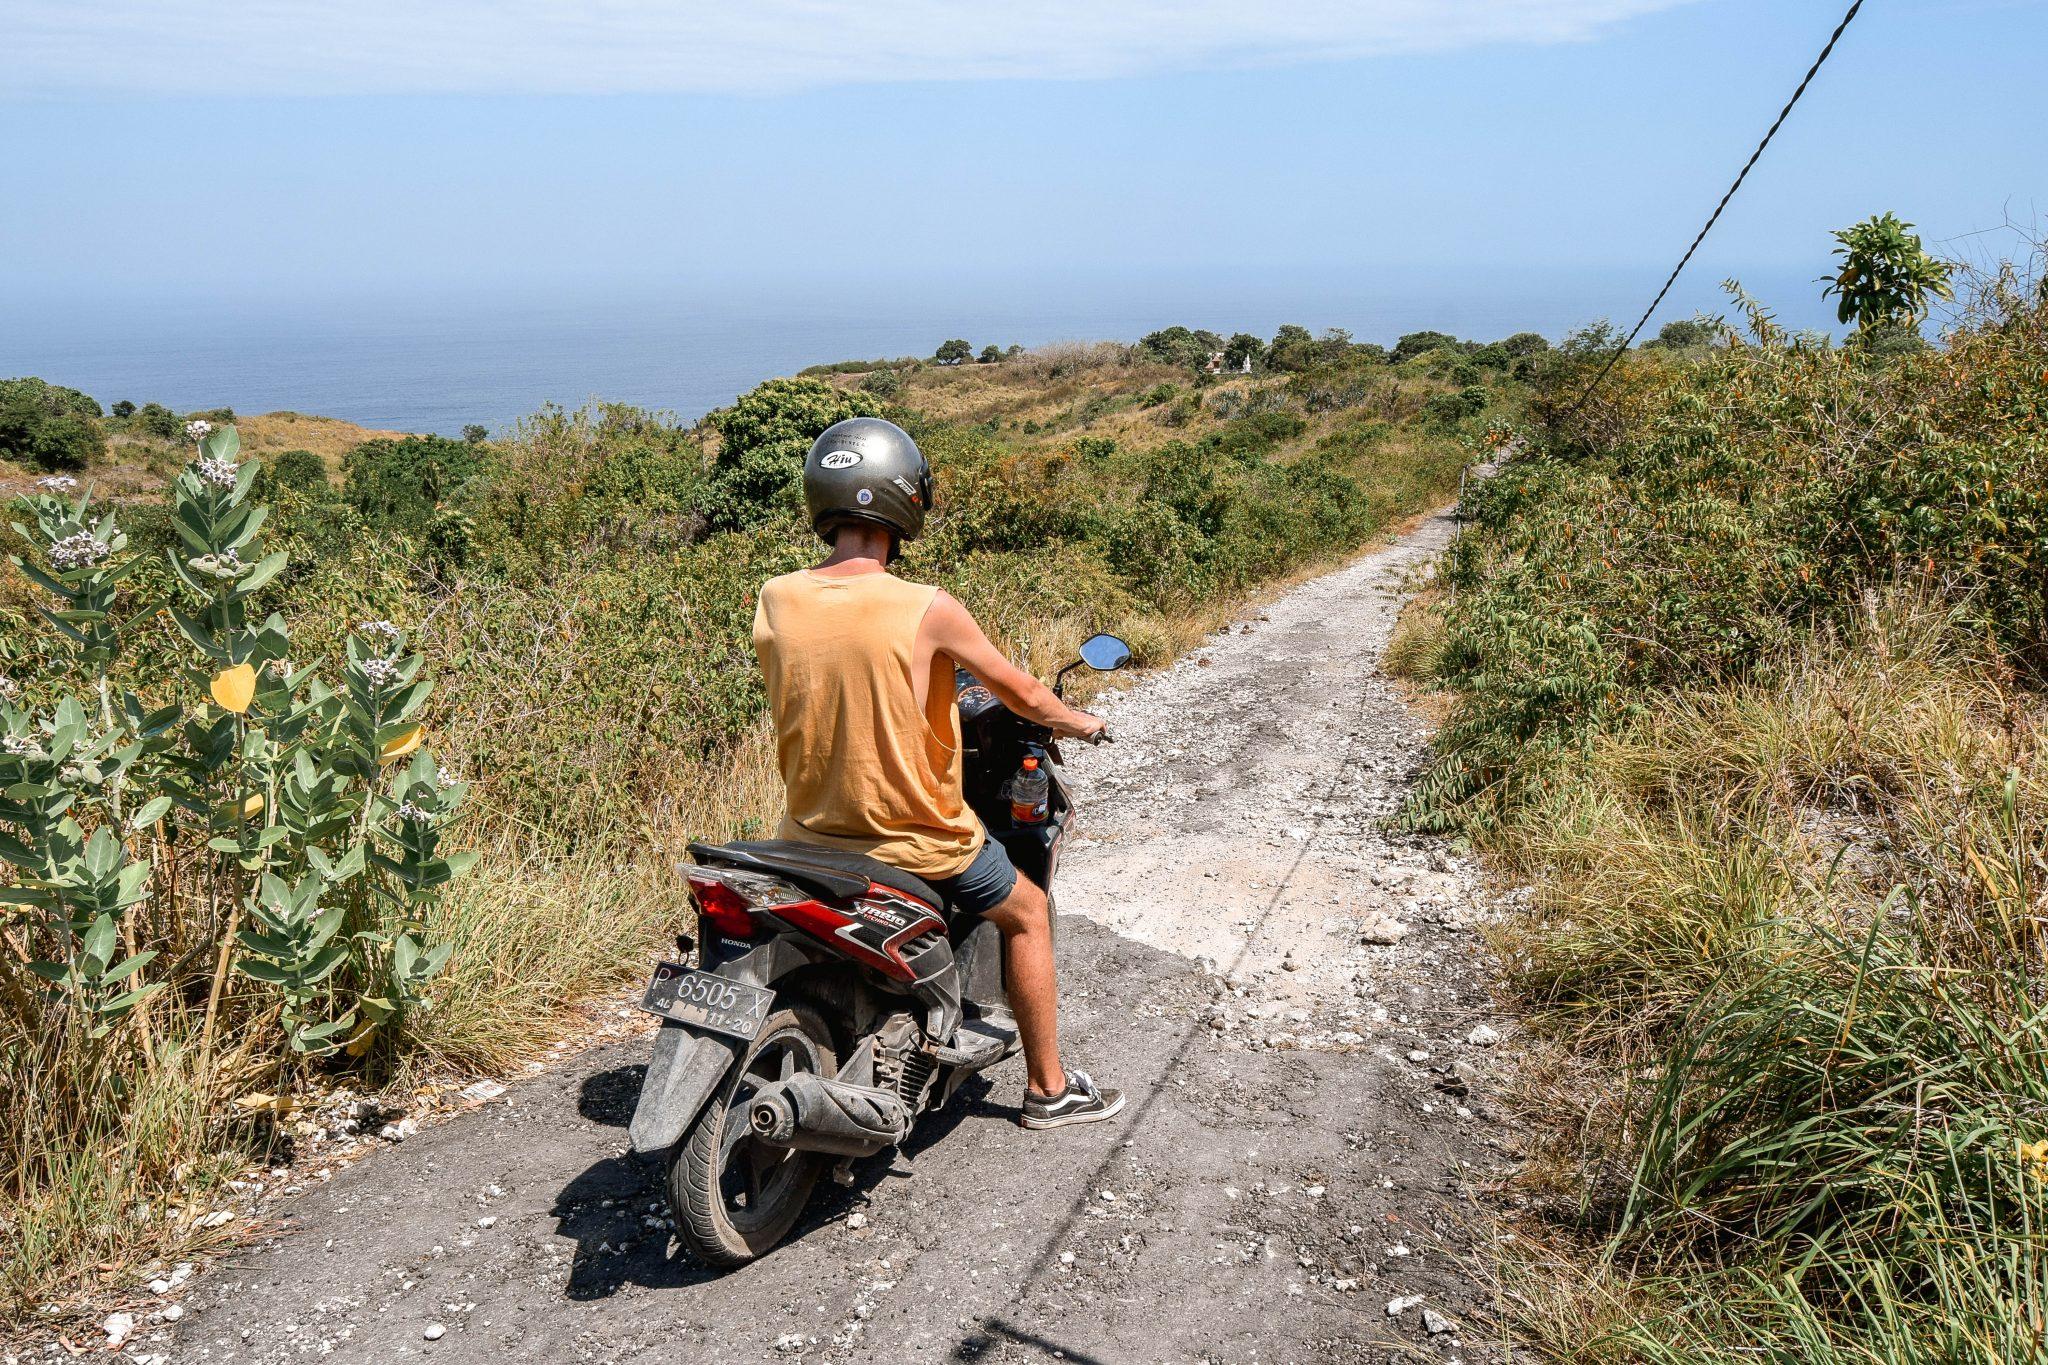 Wanderers & Warriors - Charlie & Lauren UK Travel Couple - Banah Cliff Point Nusa Penida Bali - viewpoint nusa penida viewpoint - cliff nusa penida cliff